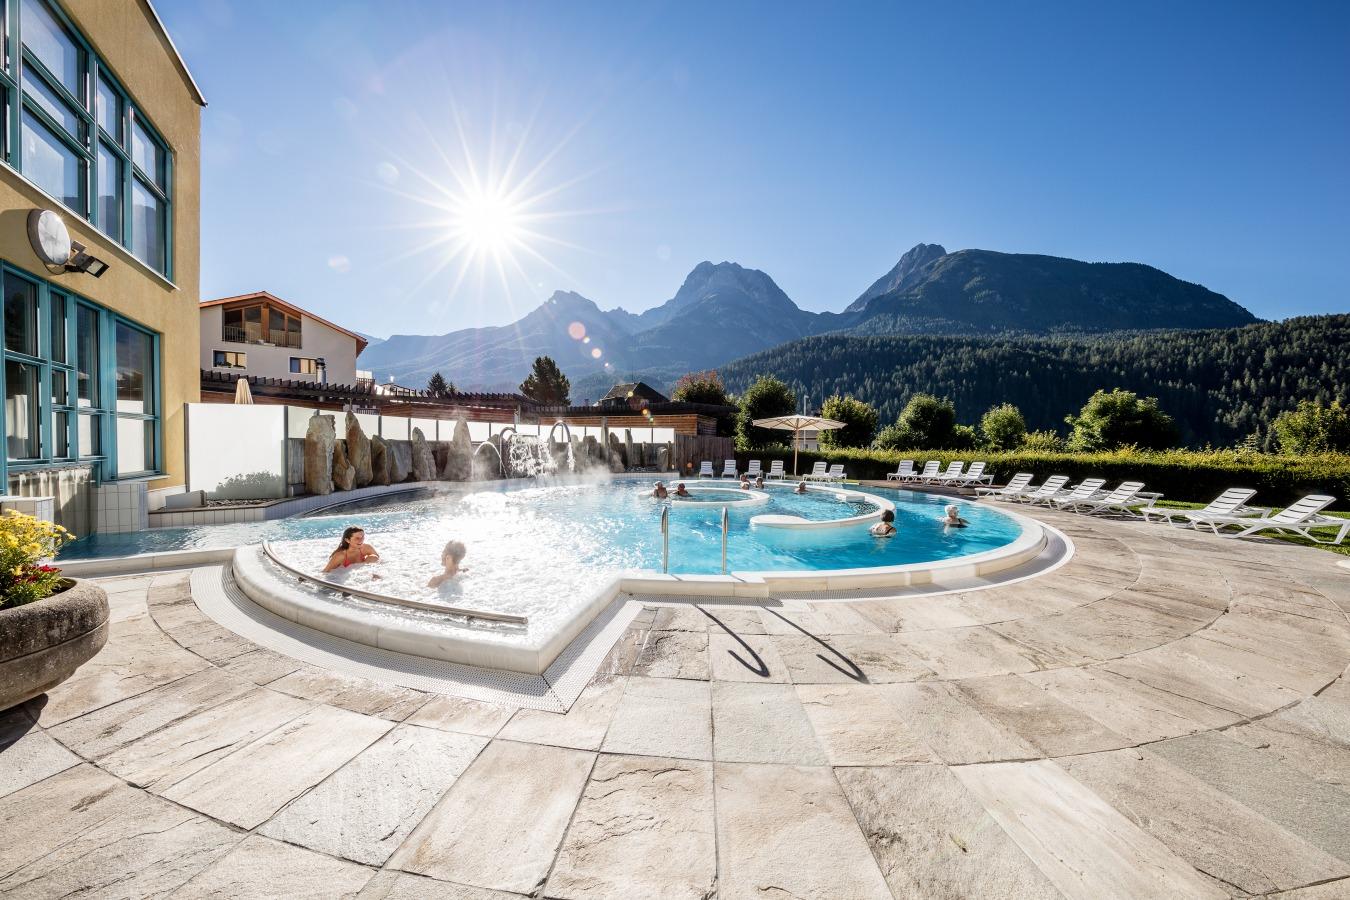 Bagni Termali Svizzera : Bagni termali a saillon thermal resort at saillon vallese svizzera